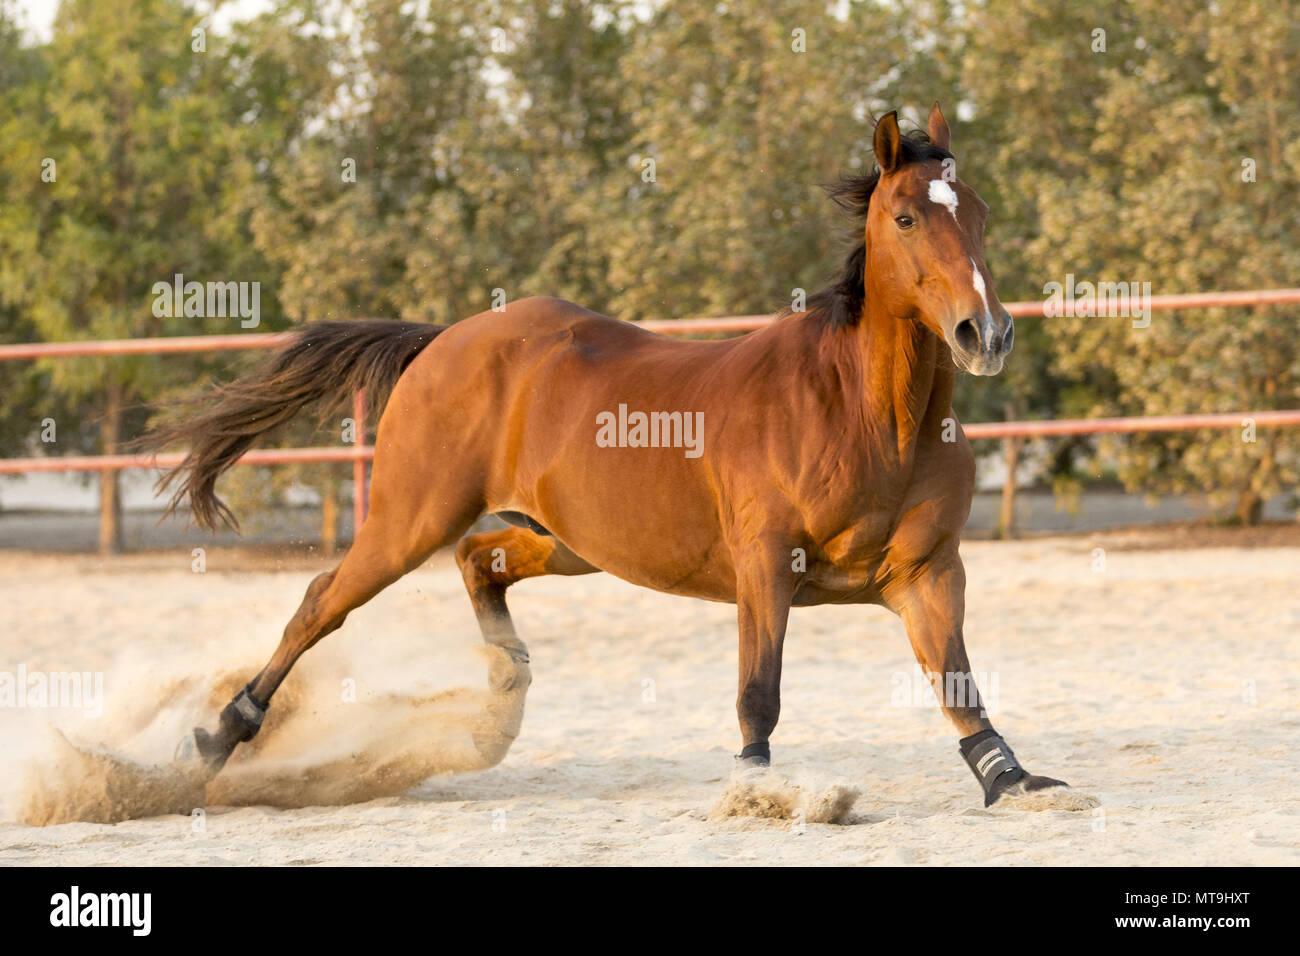 Australian Stockhorse. Bay gelding stopping in a paddock. Abu Dhabi - Stock Image